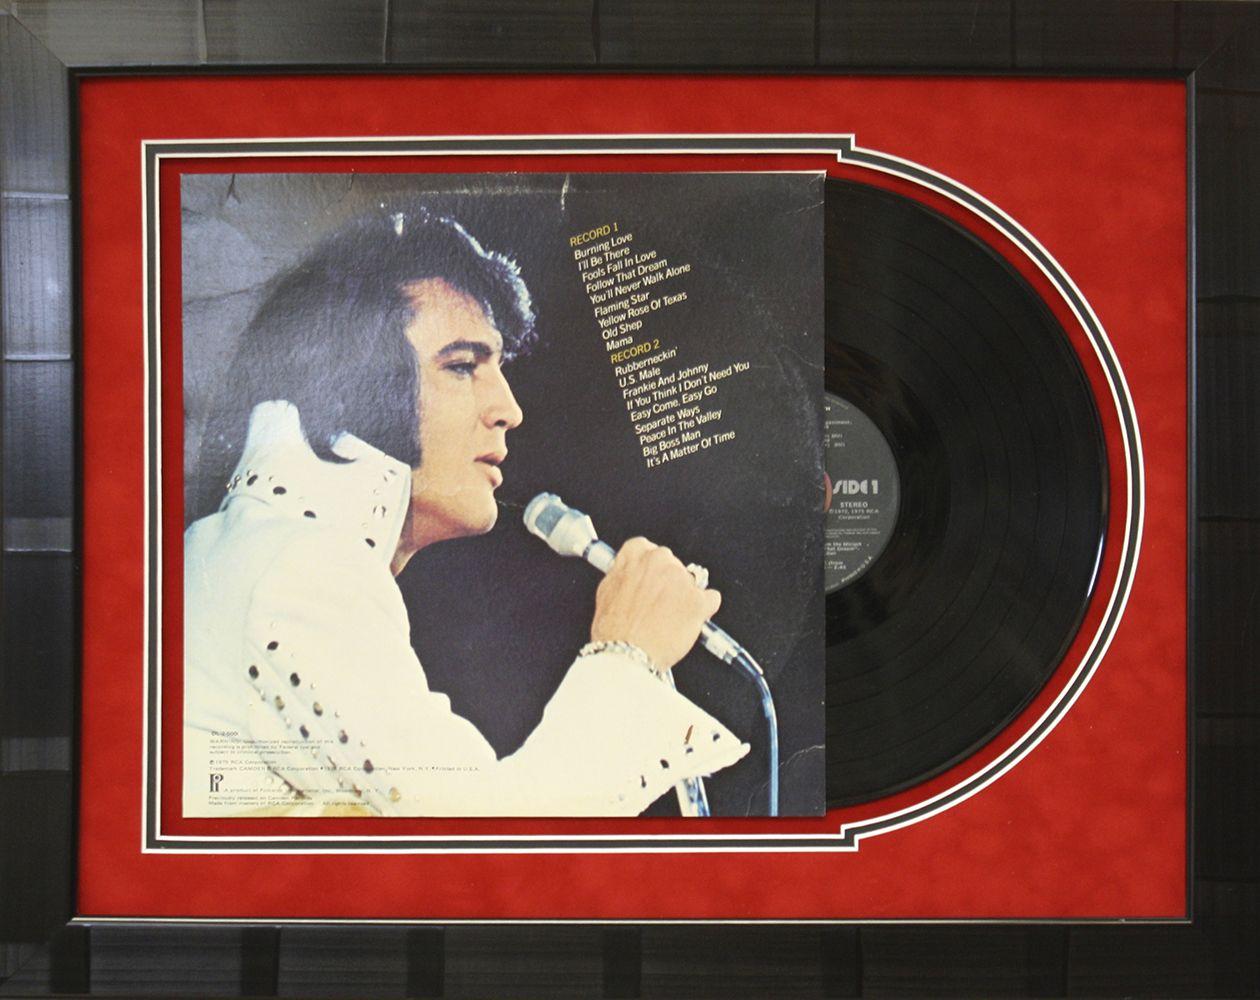 Elvis album art framed with custom suede mat board to reveal elvis album art framed with custom suede mat board to reveal record designed and framed jeuxipadfo Image collections